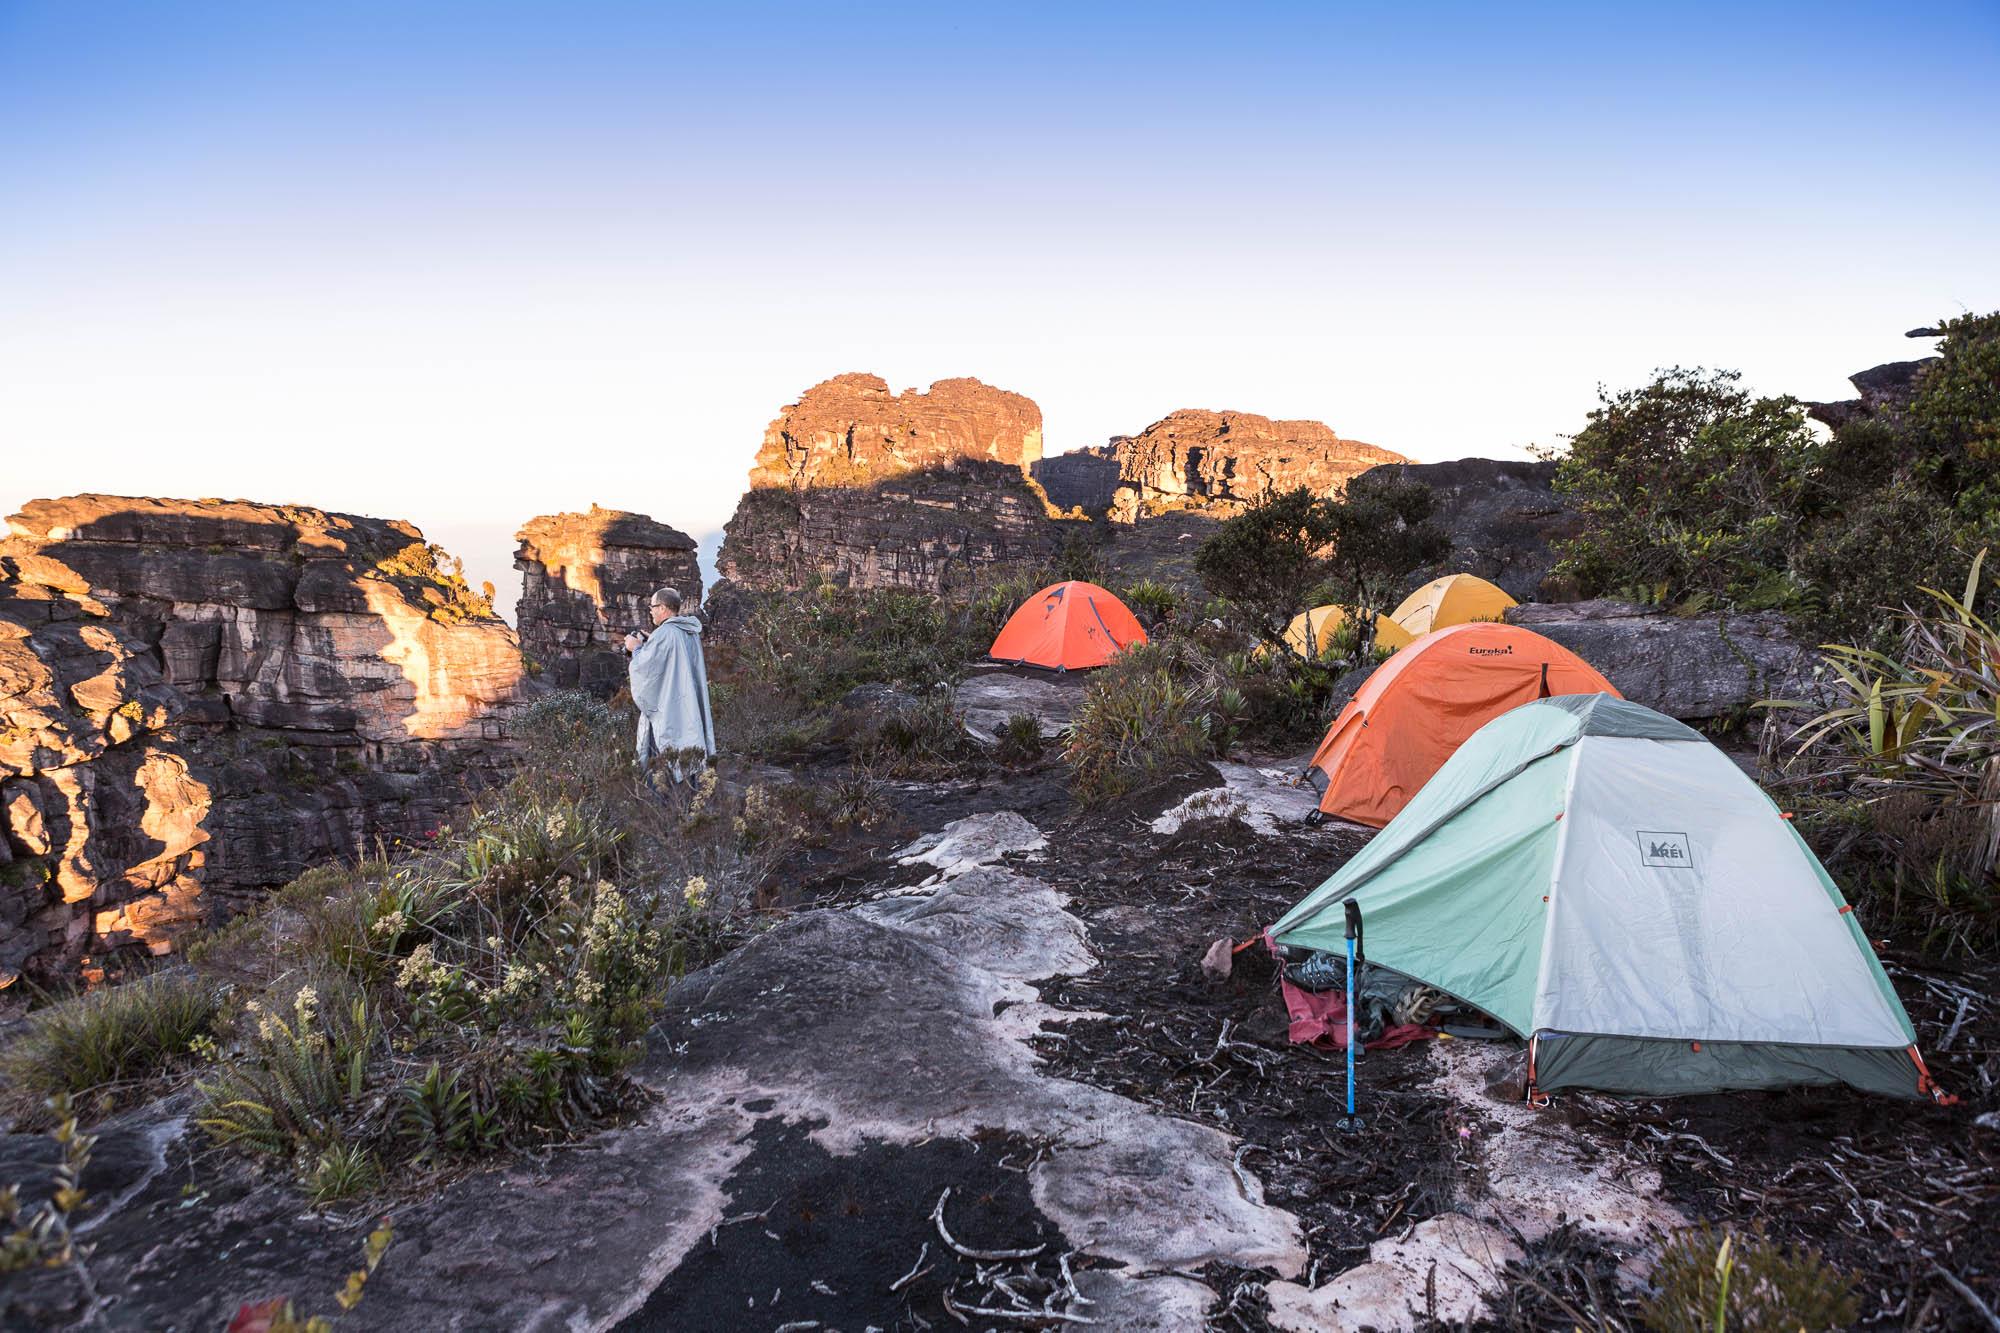 Auyantepui - No topo das quedas do anjo, Parque Nacional Canaima, Os primeiros exploradores